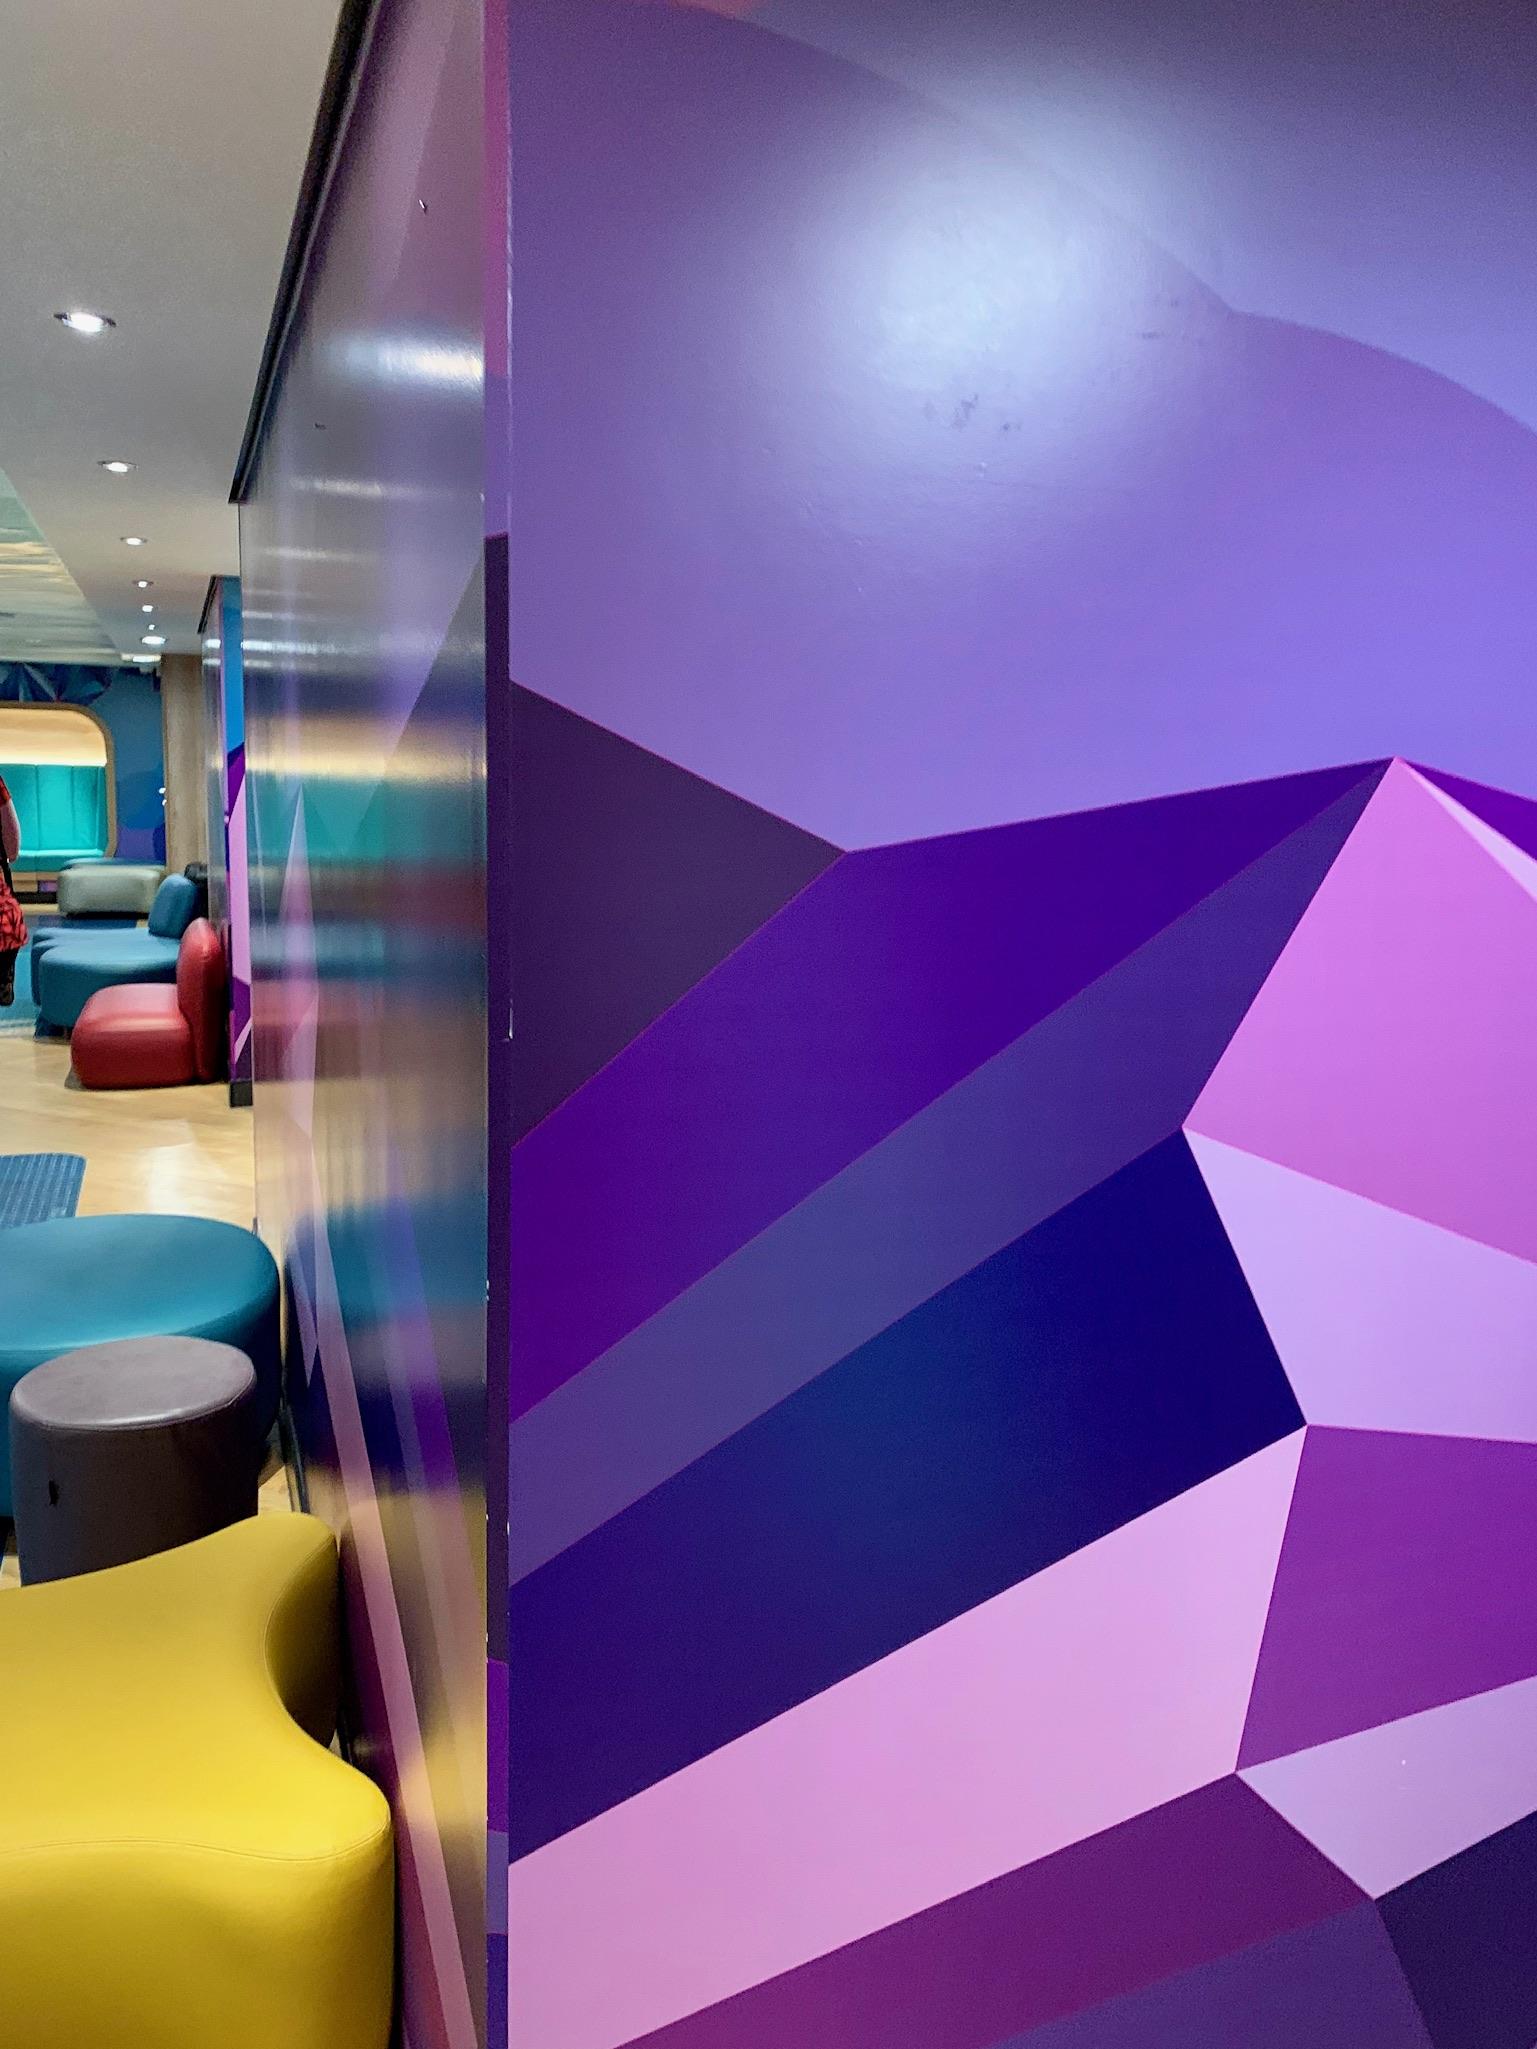 NCL Joy - Amenities - Splash Club bright colors.jpg